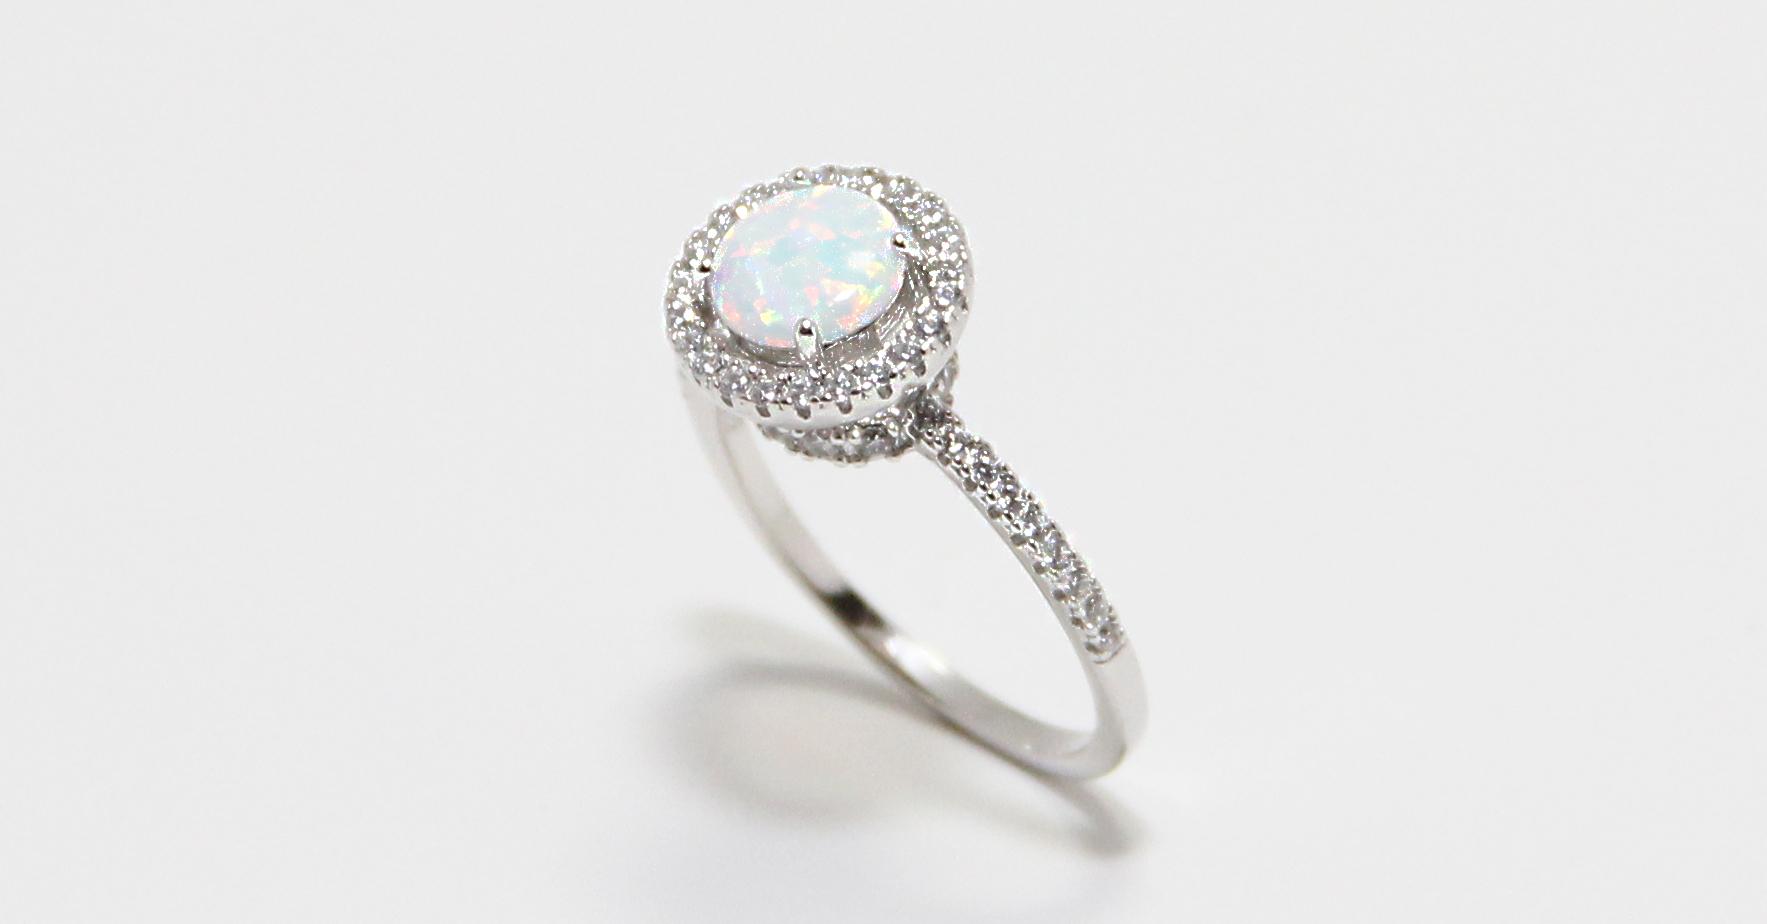 Sterling Silver Opal Halo Ring SBGR01028